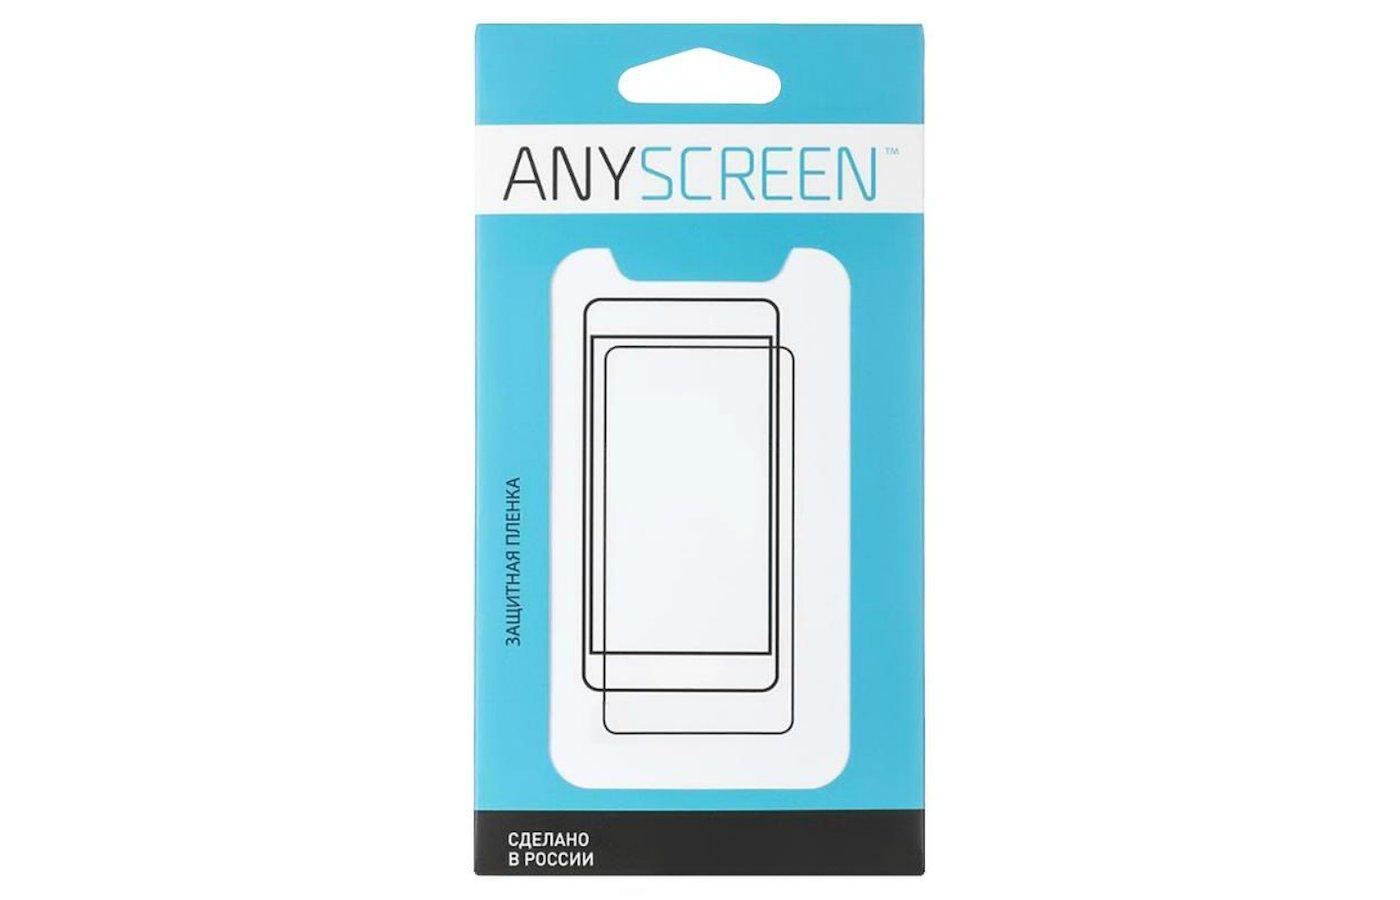 Стекло AnyScreen пленка для ZTE Blade L370 прозрачная